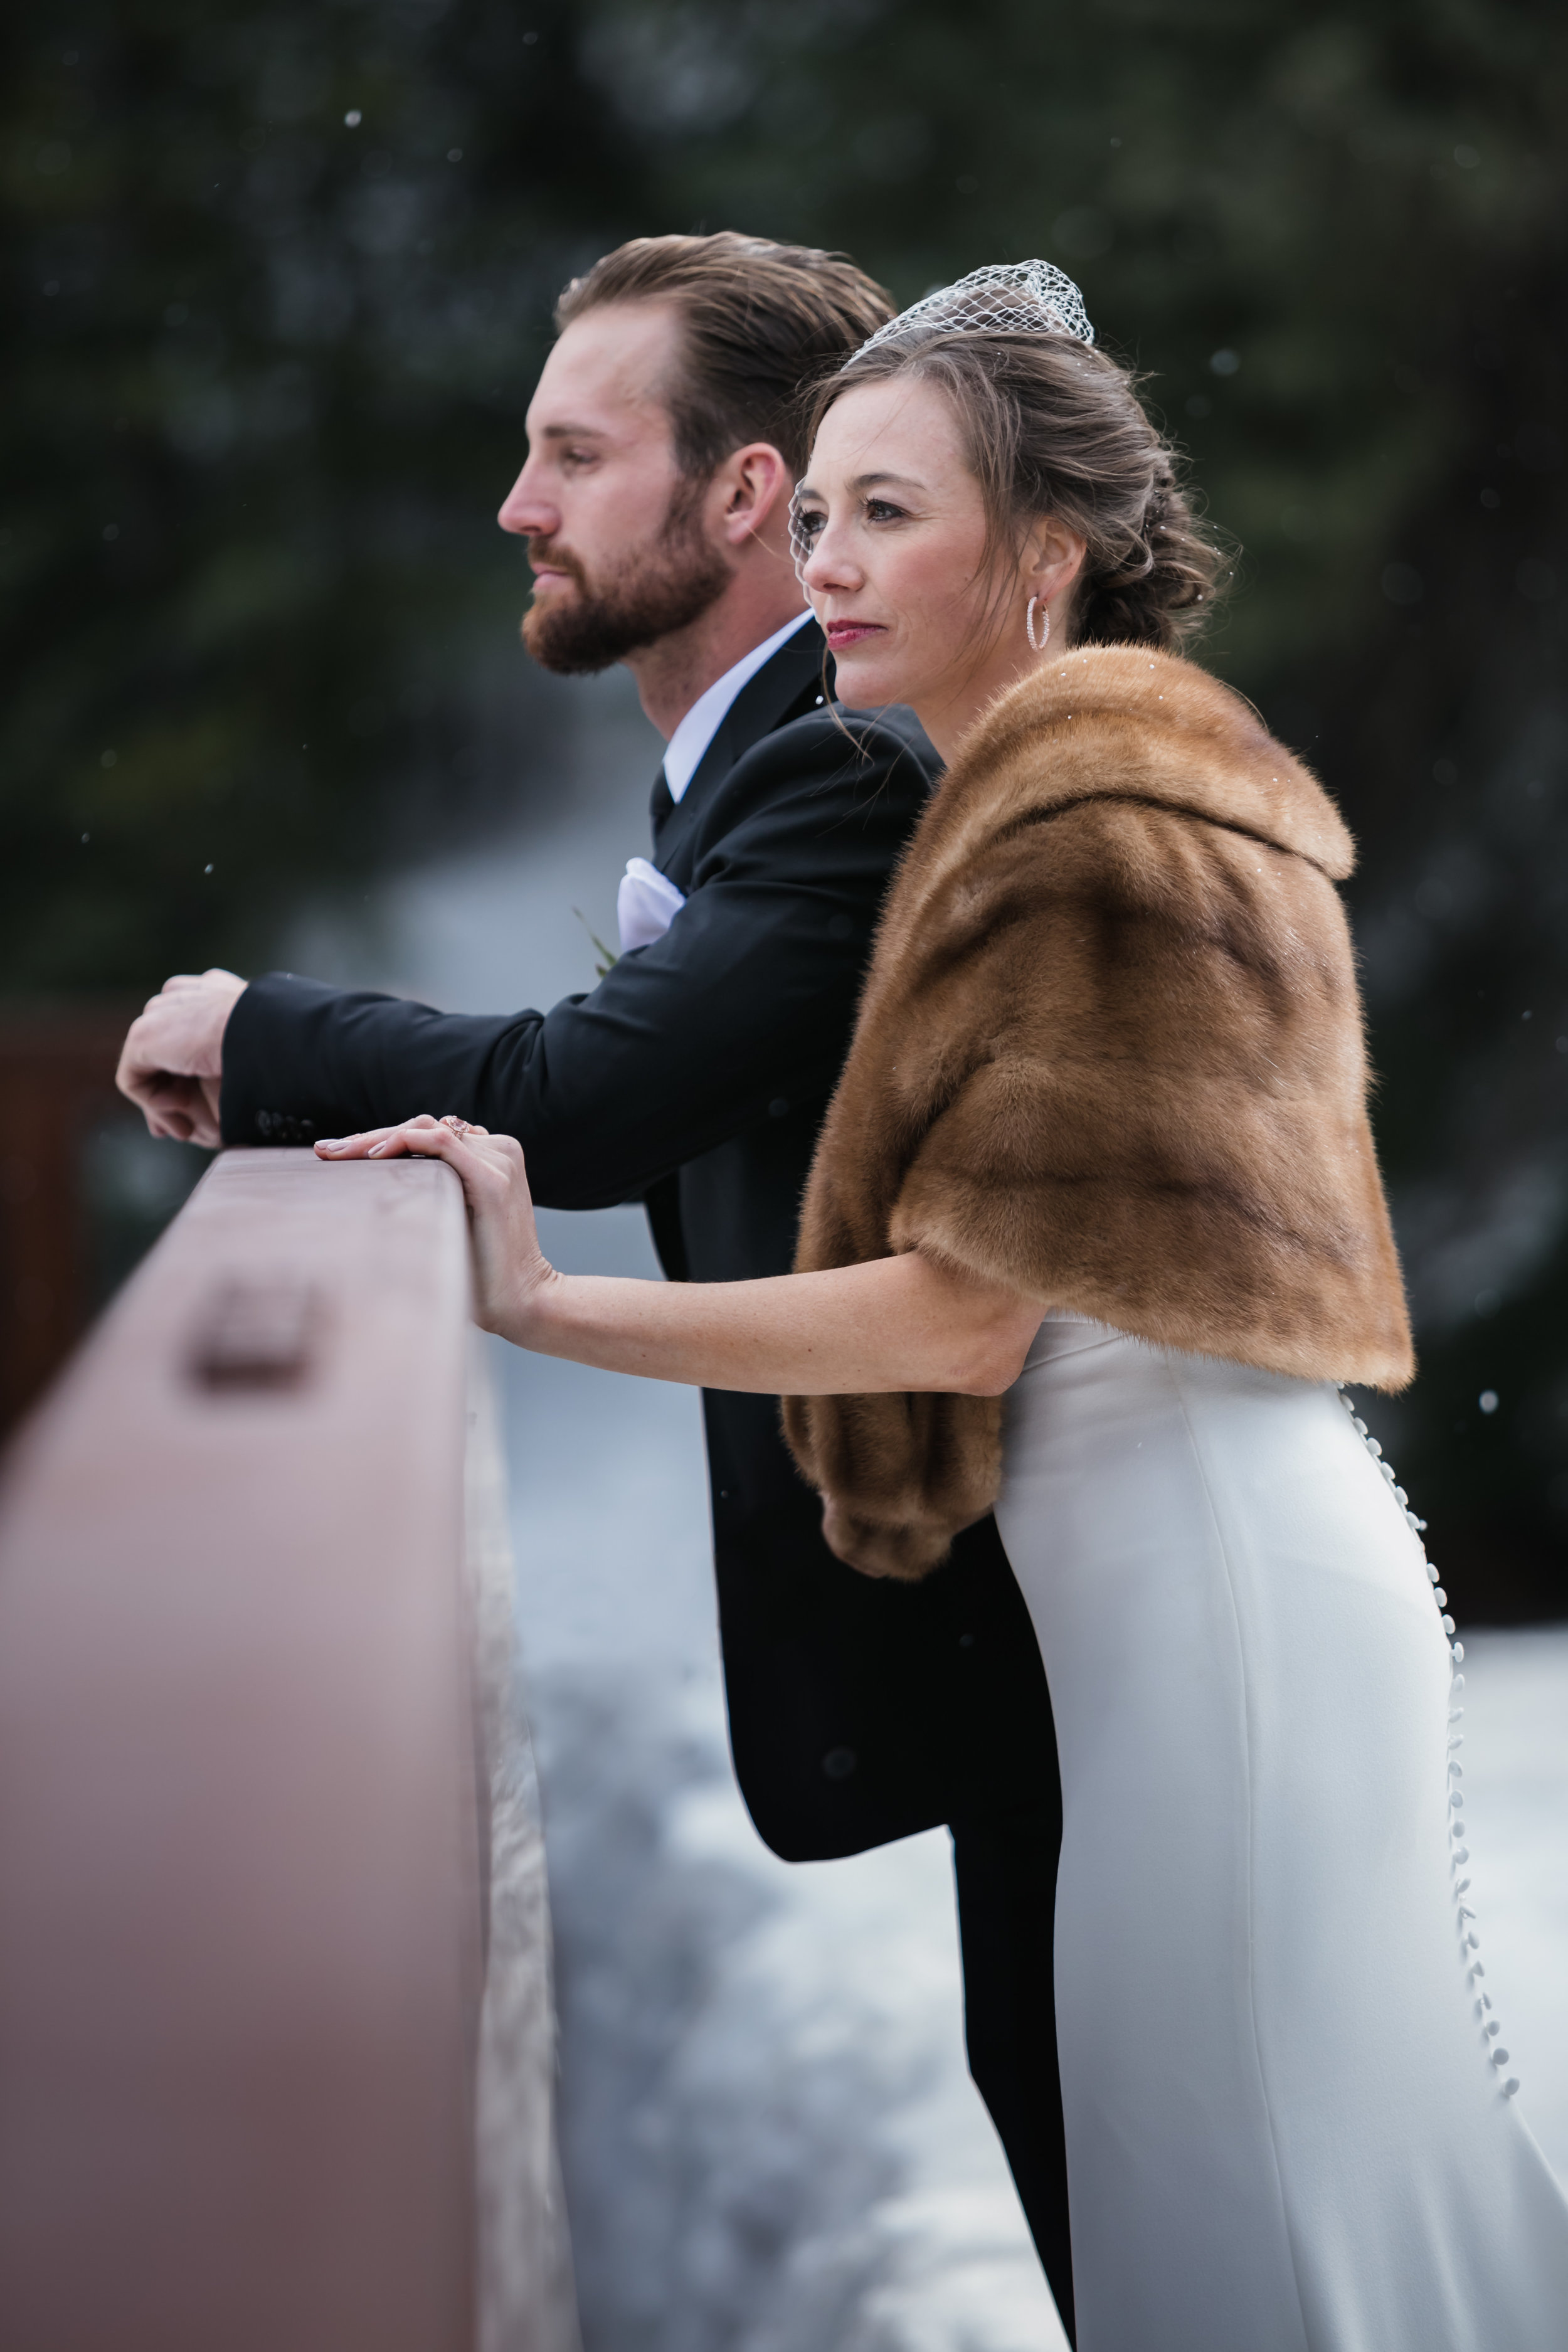 vild-photography-photographer-colorado-intimate-wedding-adventure-Stephanie- Adam-468.jpg